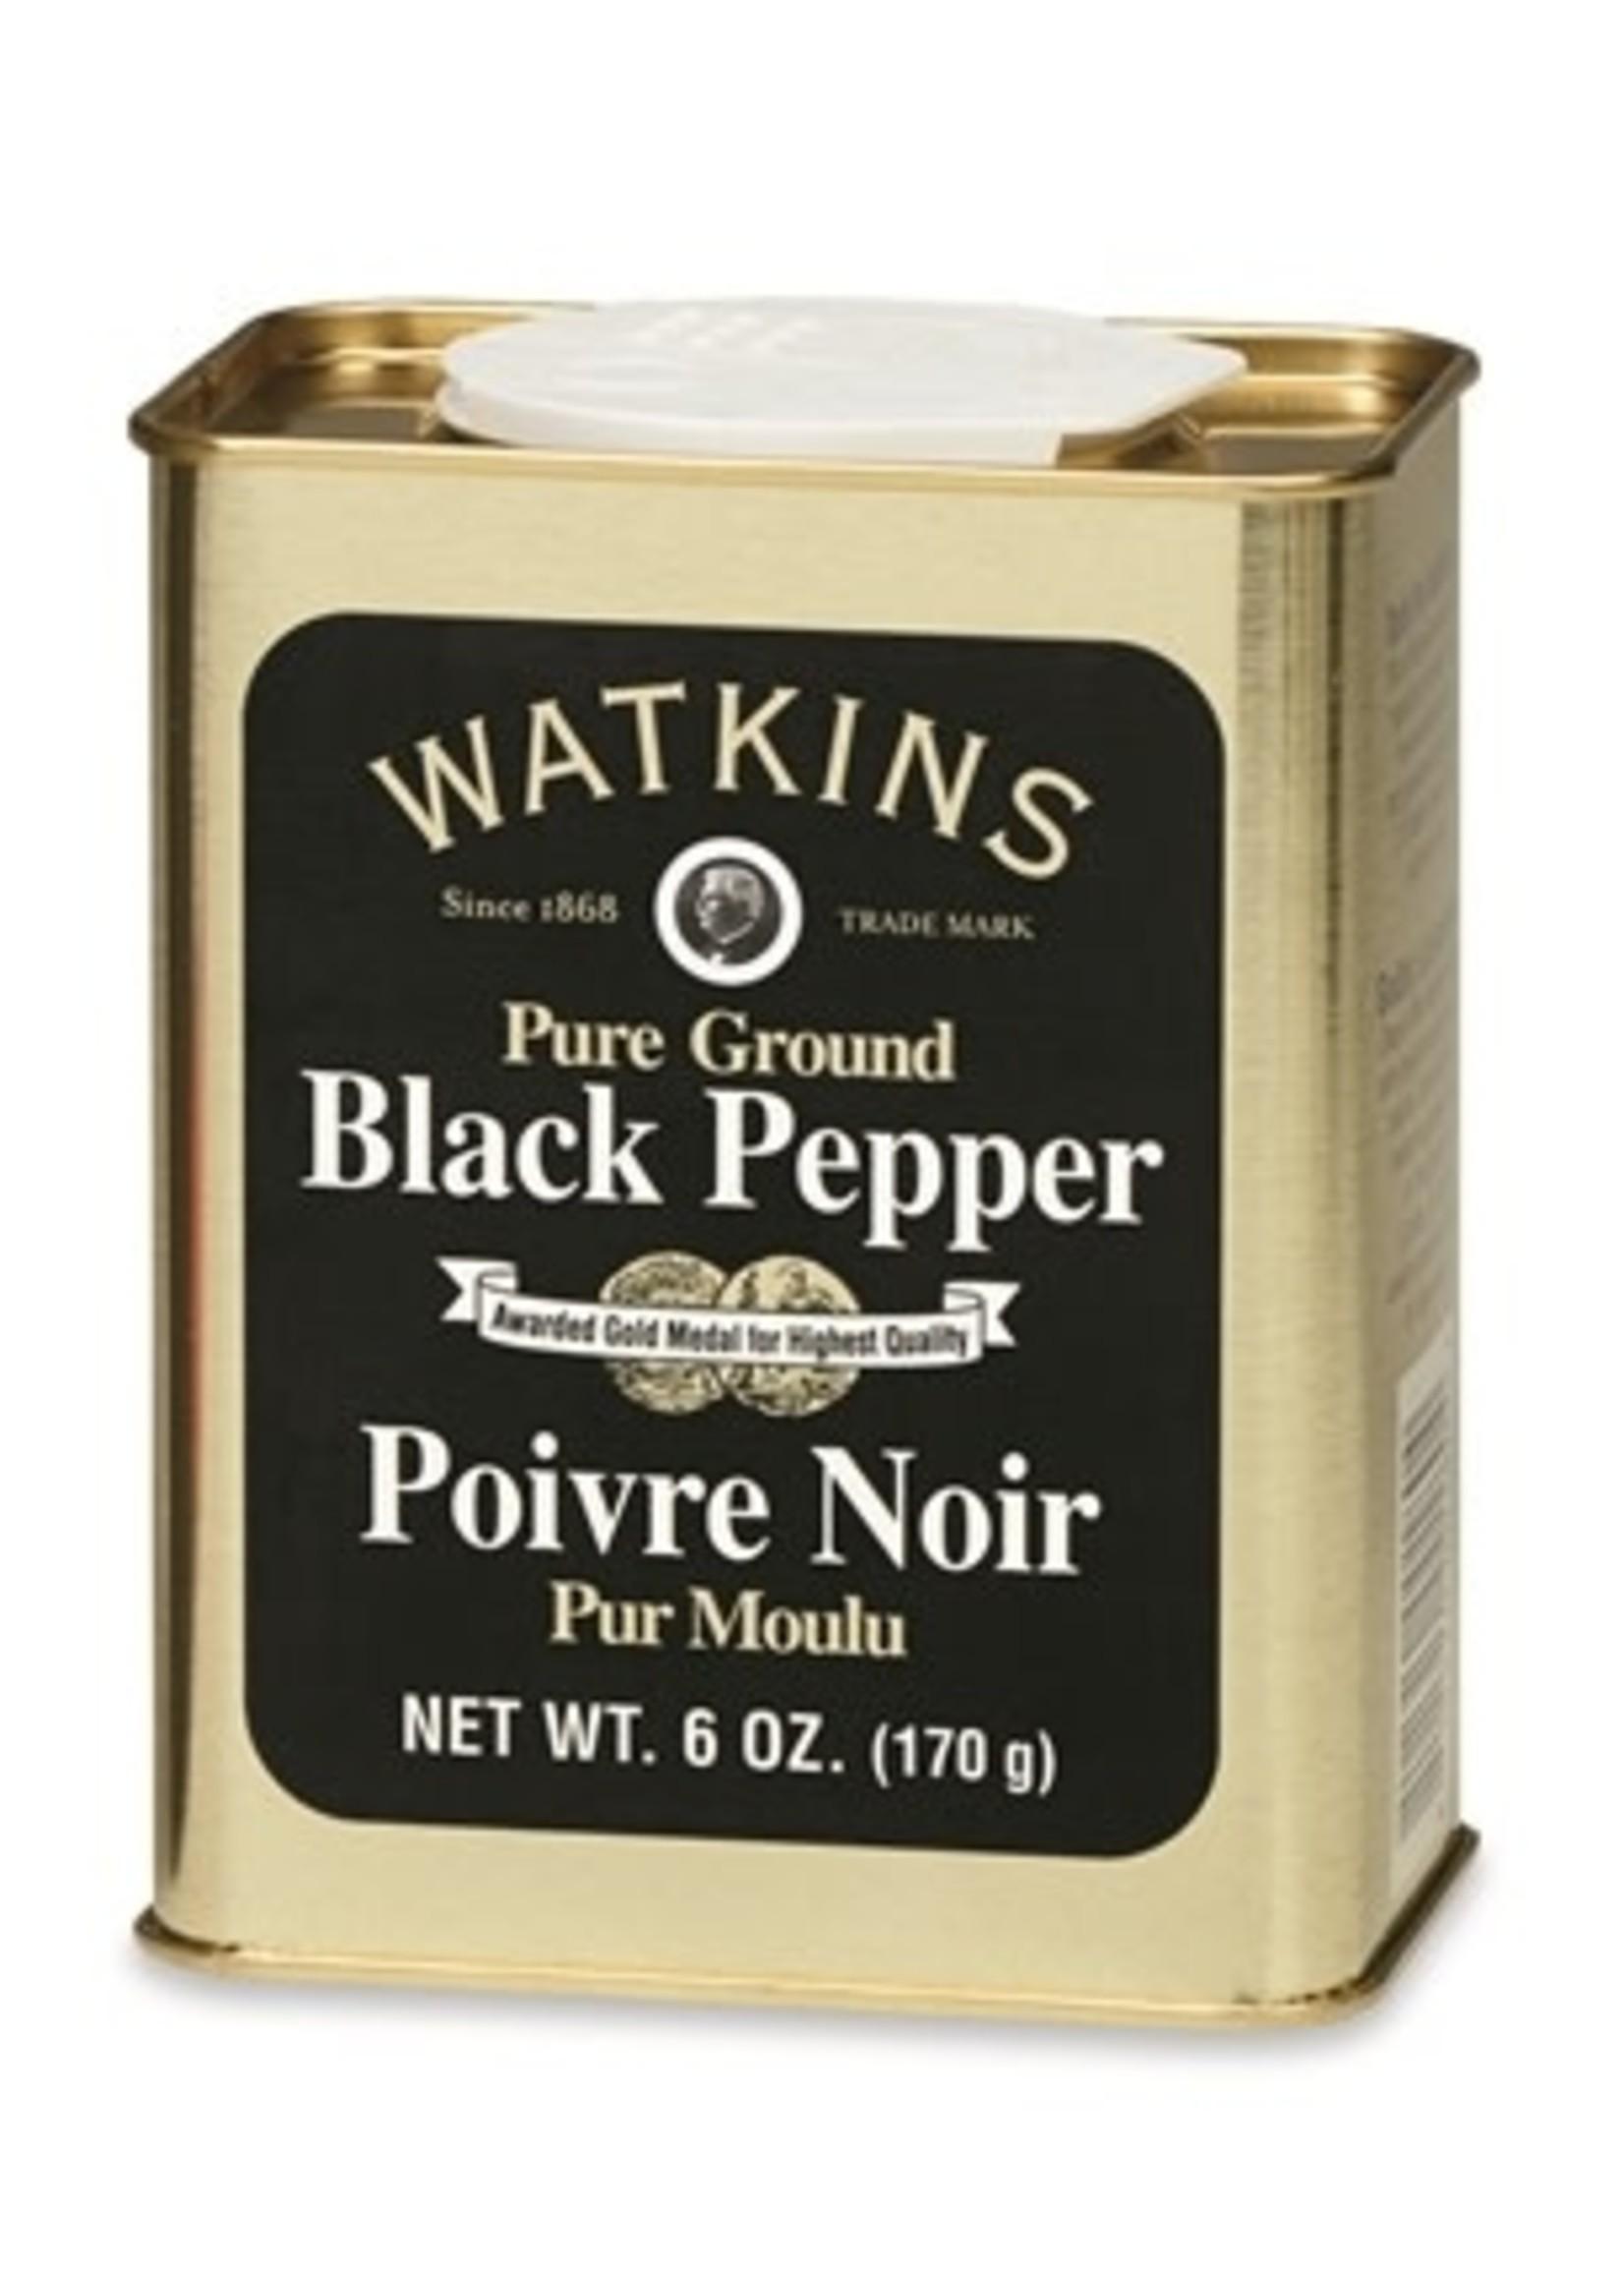 The Watkins Co. Watkins Black Pepper